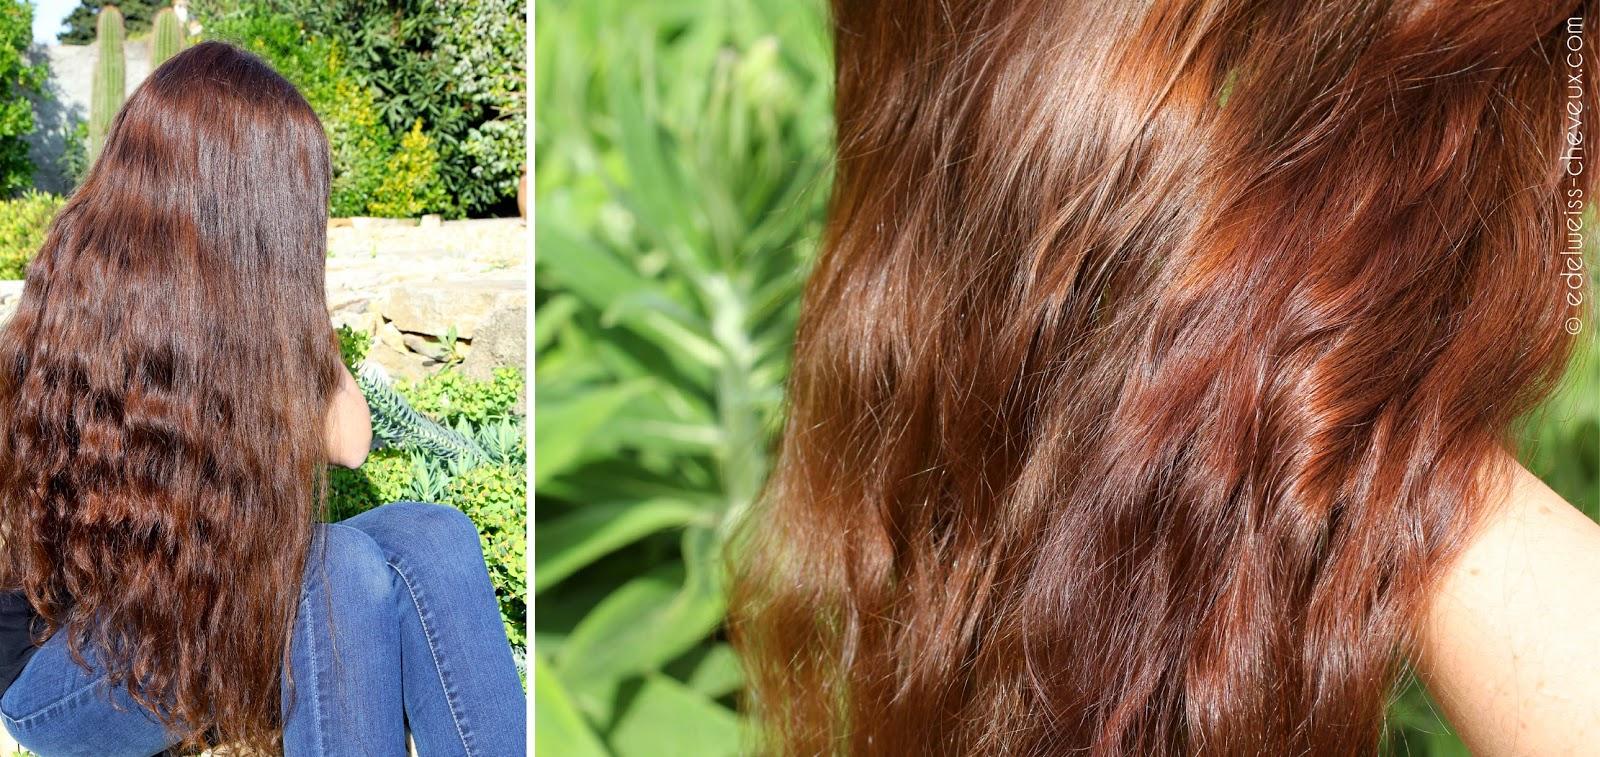 soin naturel berthe guilhem shampooing revue avis